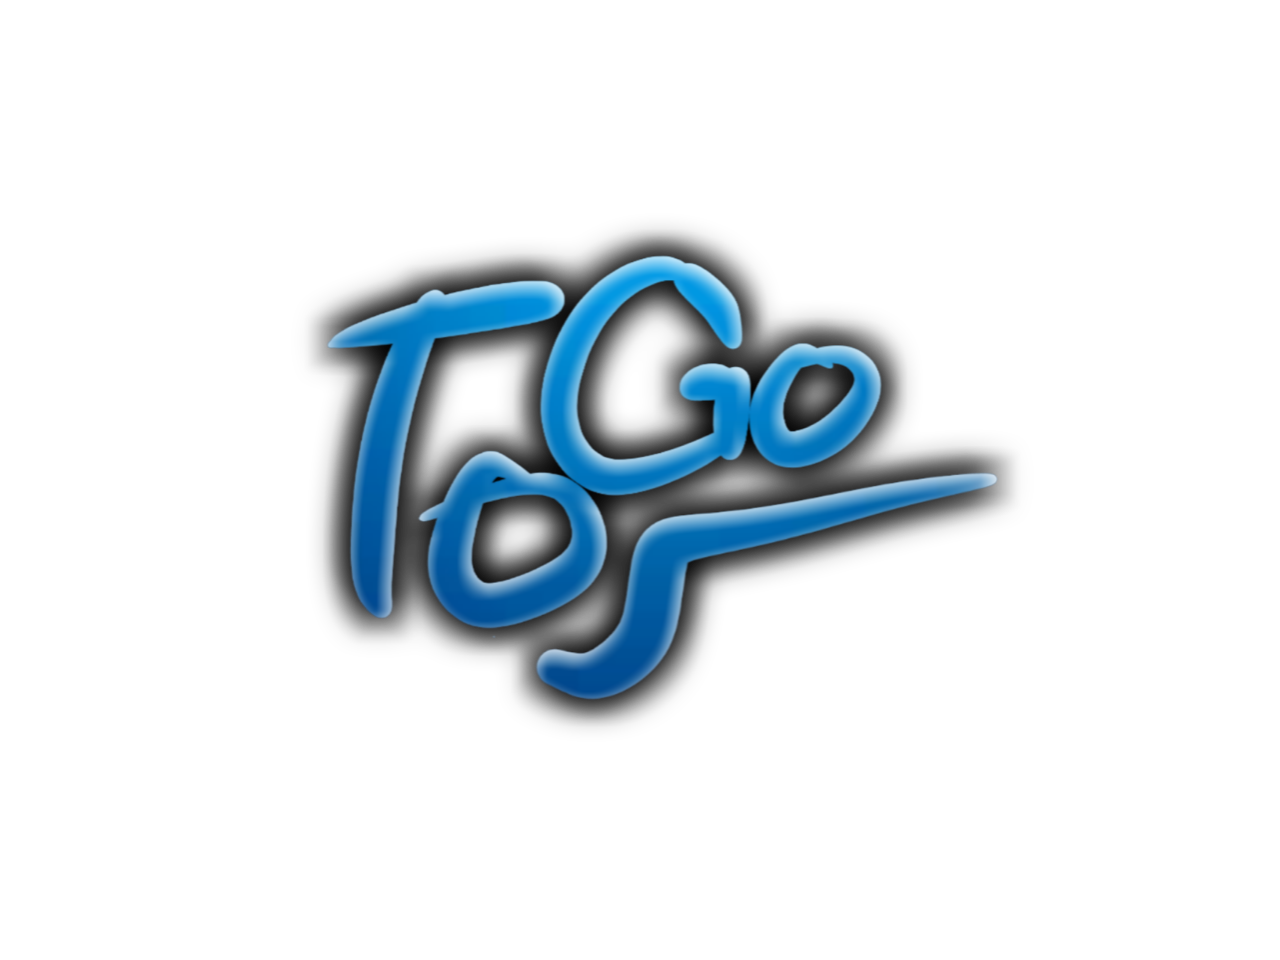 Разработать логотип и экран загрузки приложения фото f_9045aaec4cb972ba.png